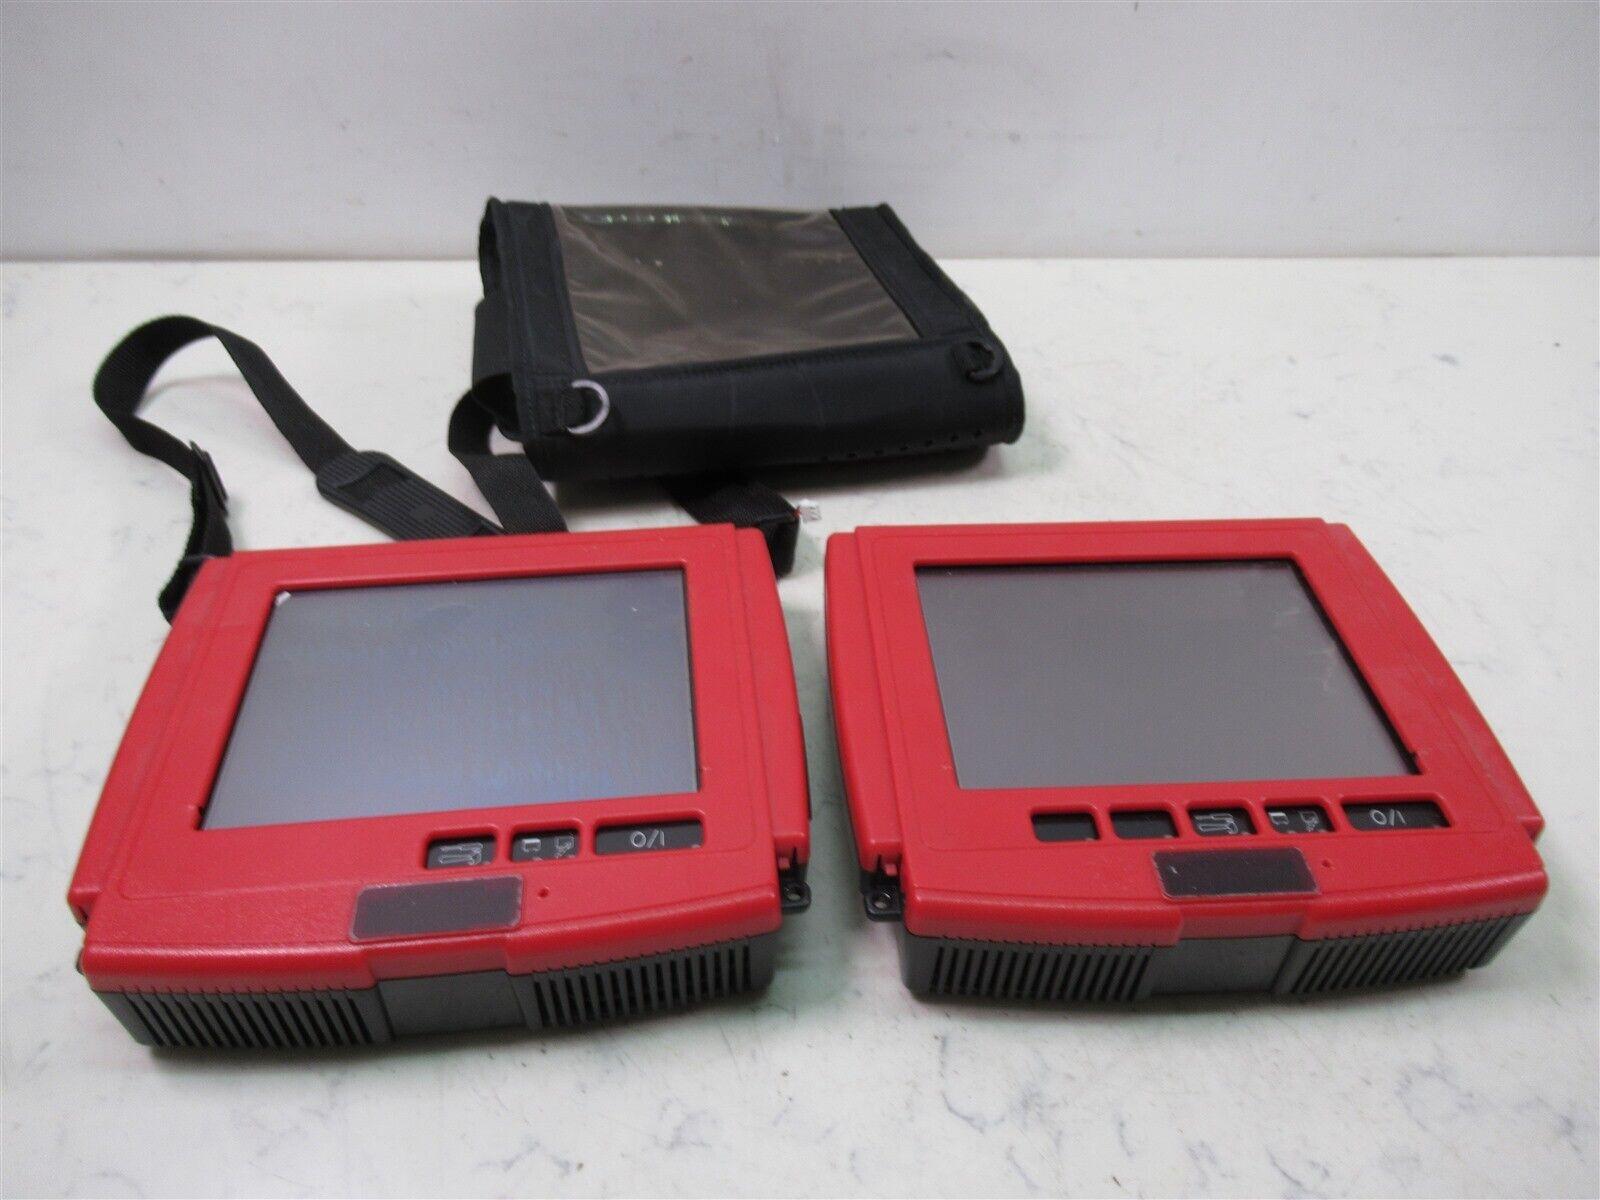 Lot of 2 Prentke Remich SB2 Spring Board Speech Communication Devices